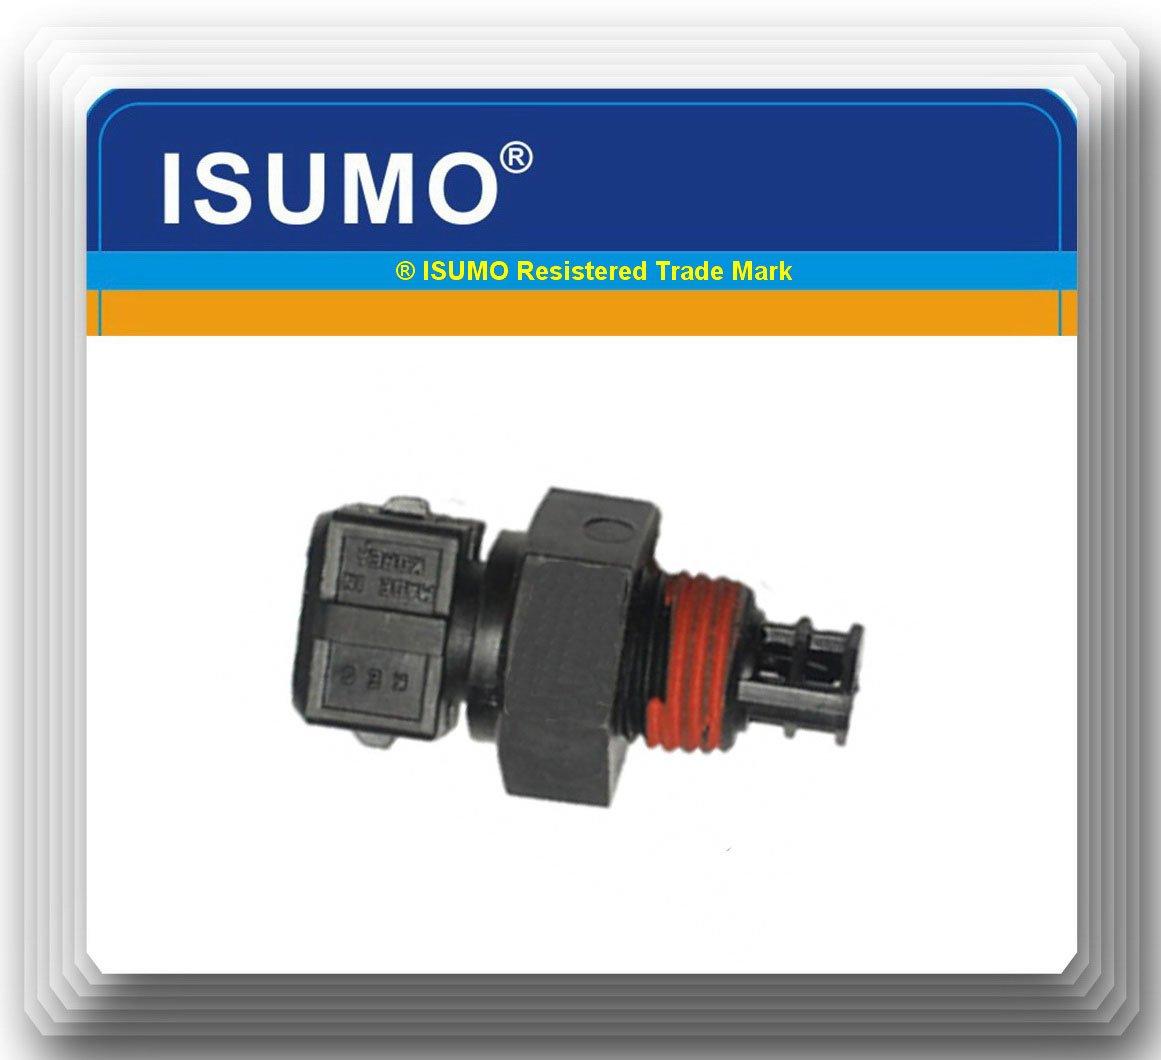 0K2A-B18-831/AX55 Intake Air Temperature Sensor Hyundai Accent (1995-1997) Hyundai Santa Fe (2001-2006) Hyundai Sonata (1999-2005) Hyundai Tiburon (2003-2008) Hyundai Tucson (2005-2009) by ISUMO